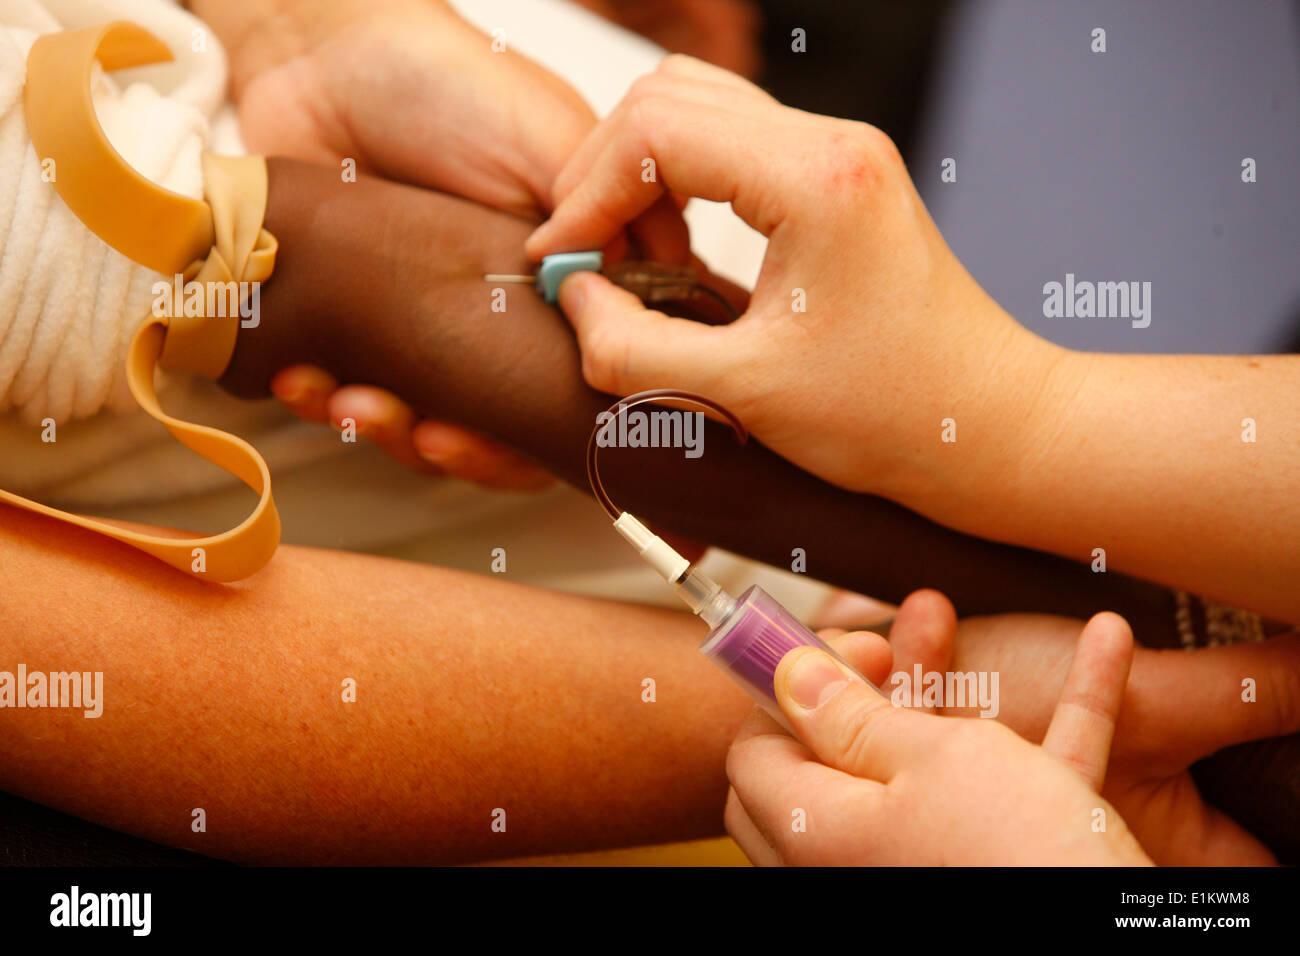 Blood test - Stock Image